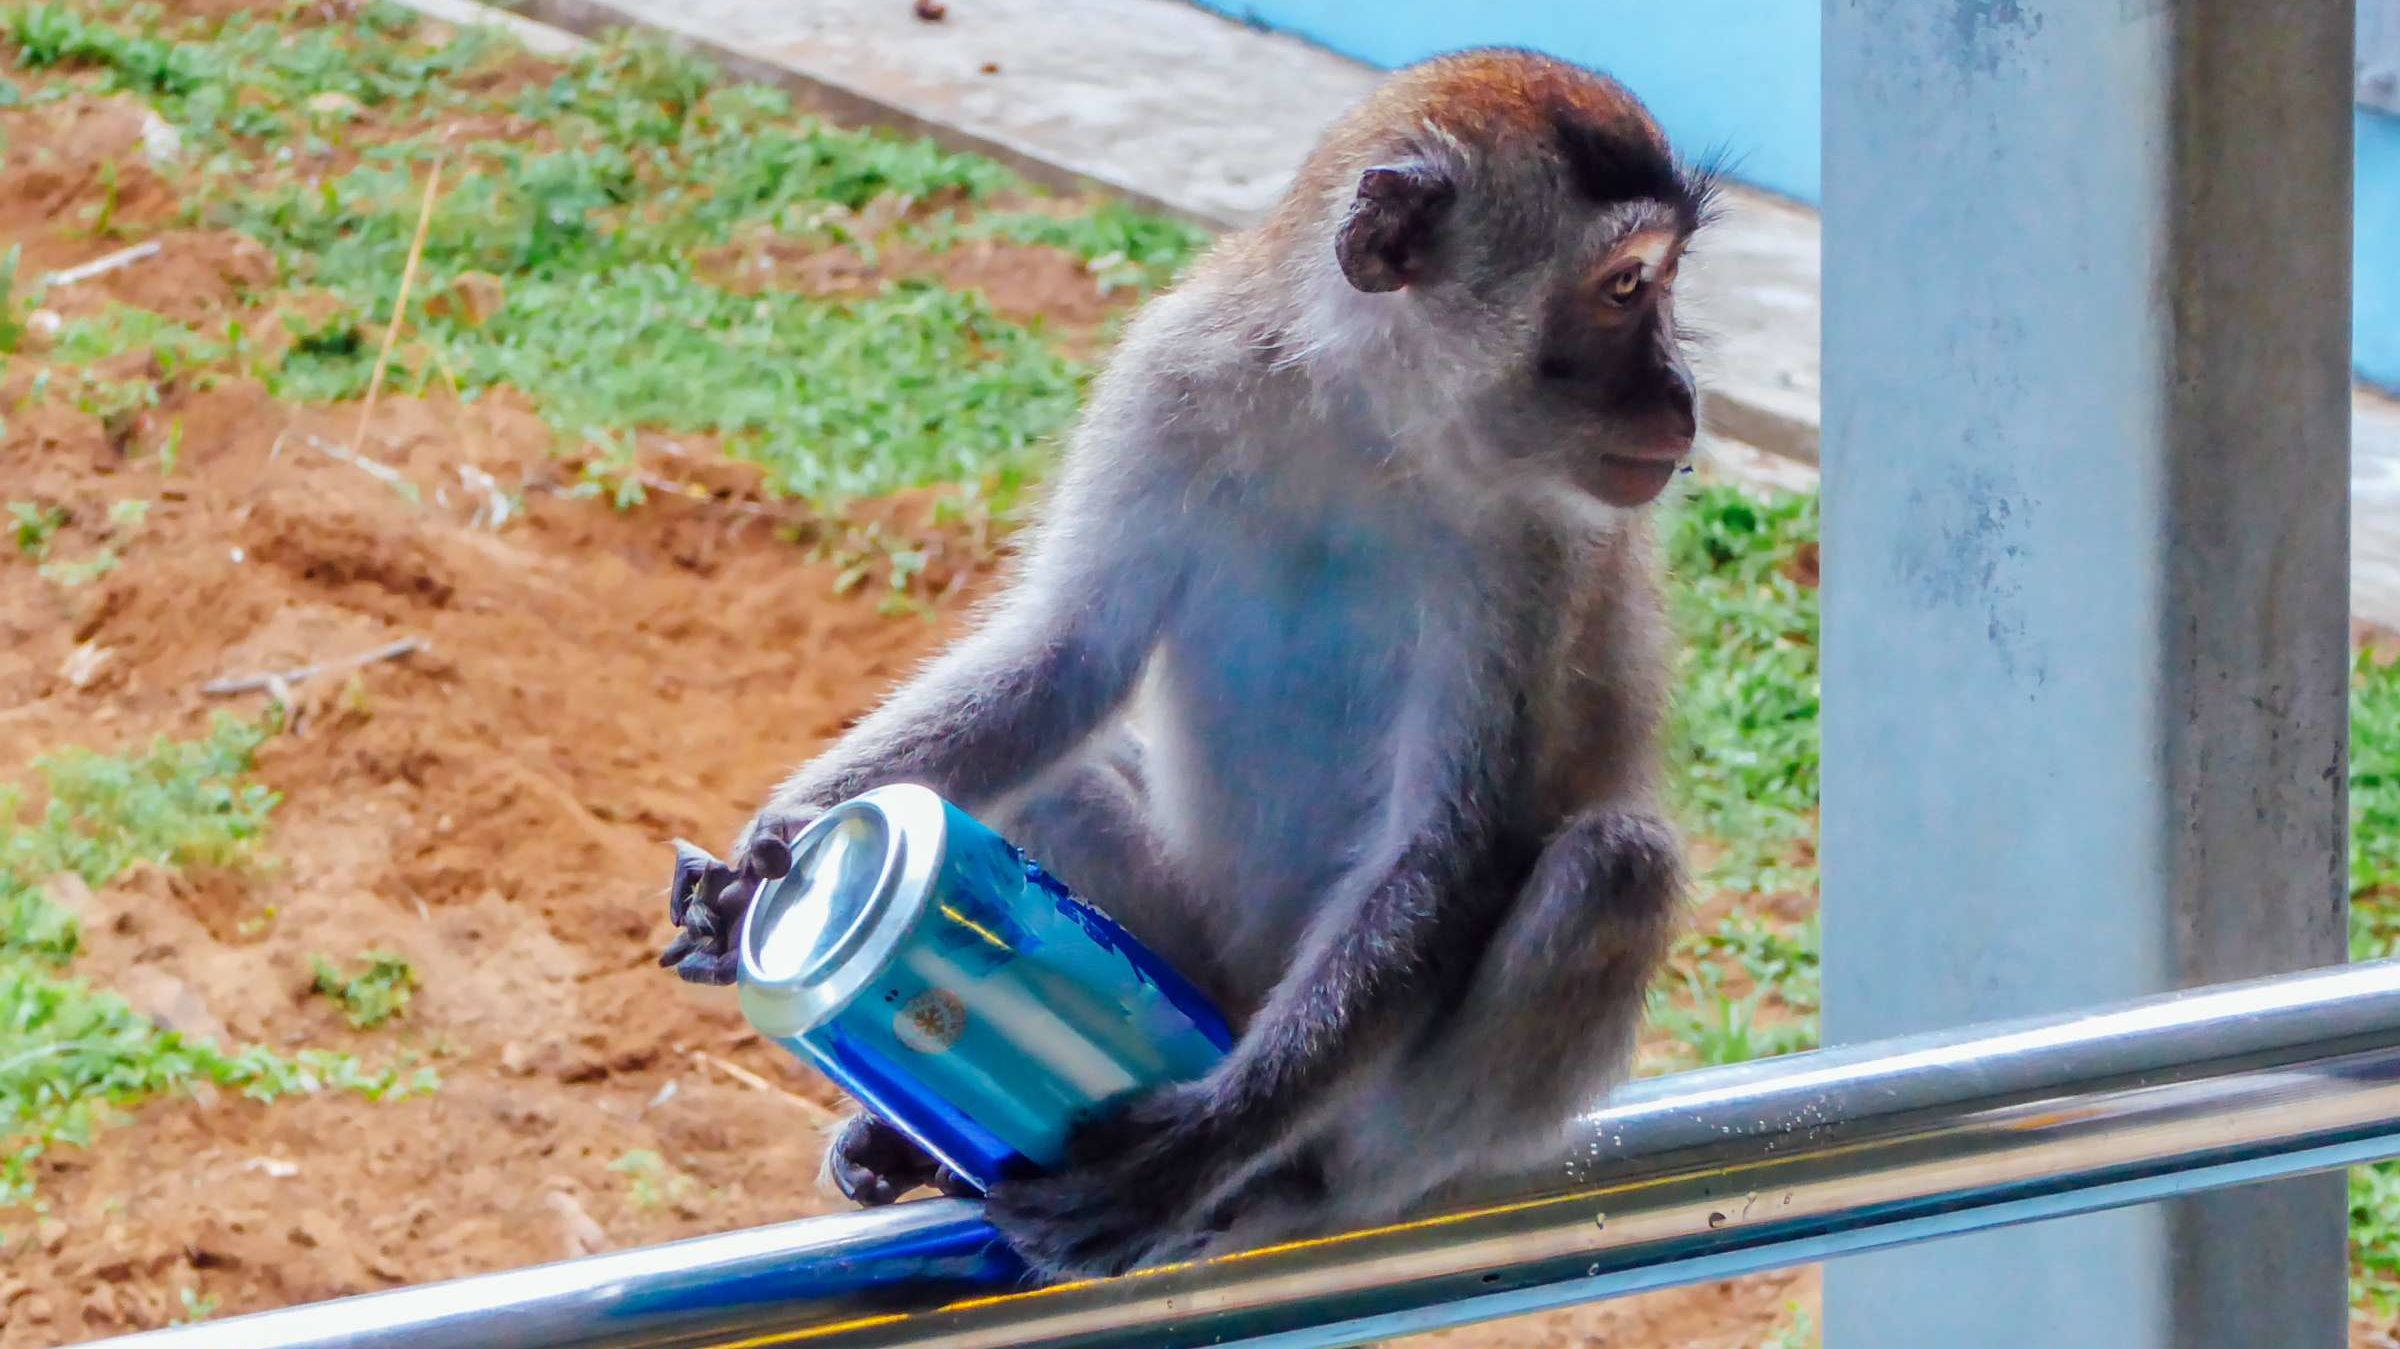 11 Times Drunk Animals Have Wreaked Havoc